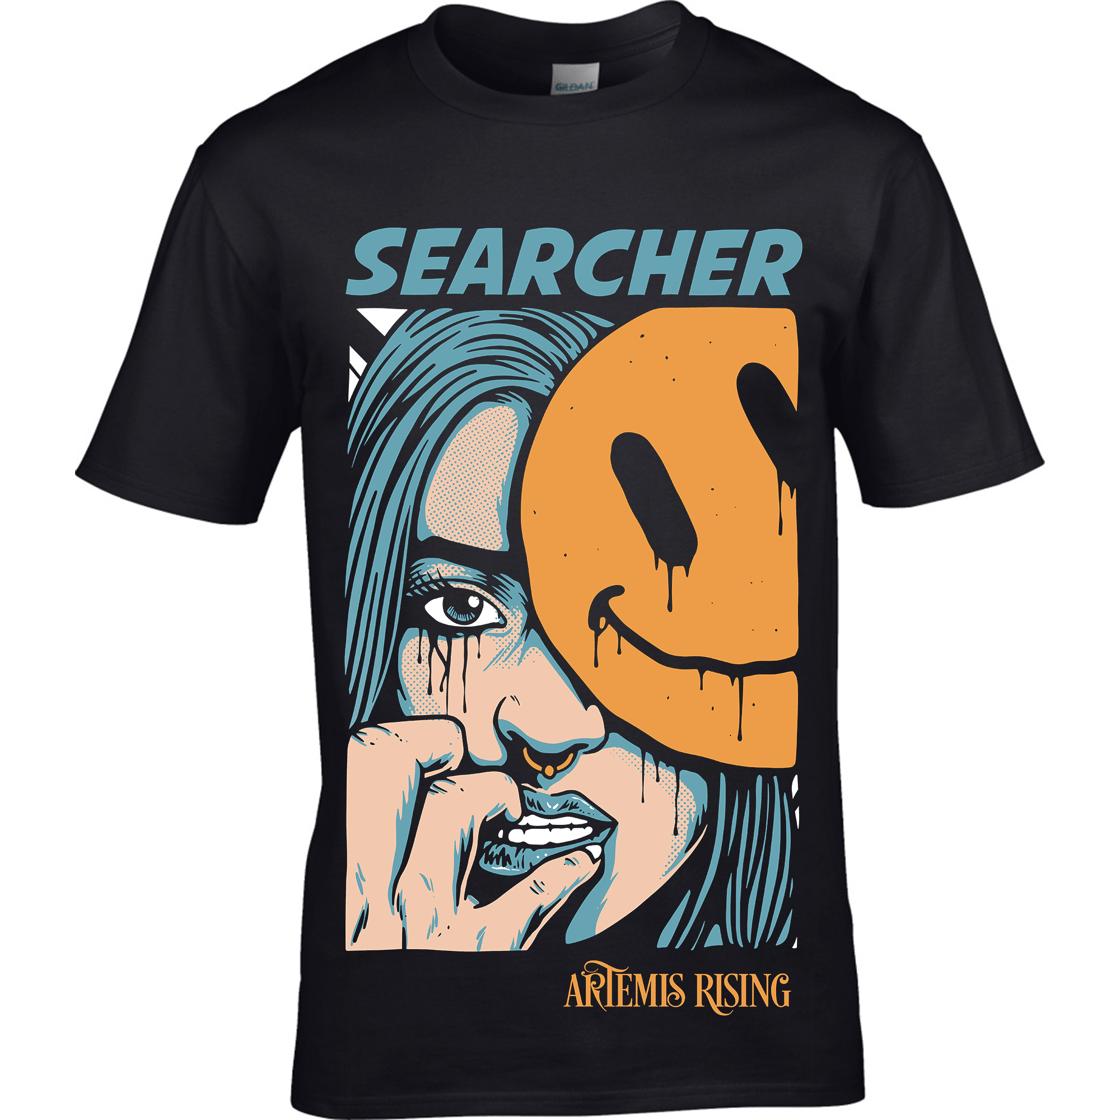 Image of Artemis Rising Searcher Shirt